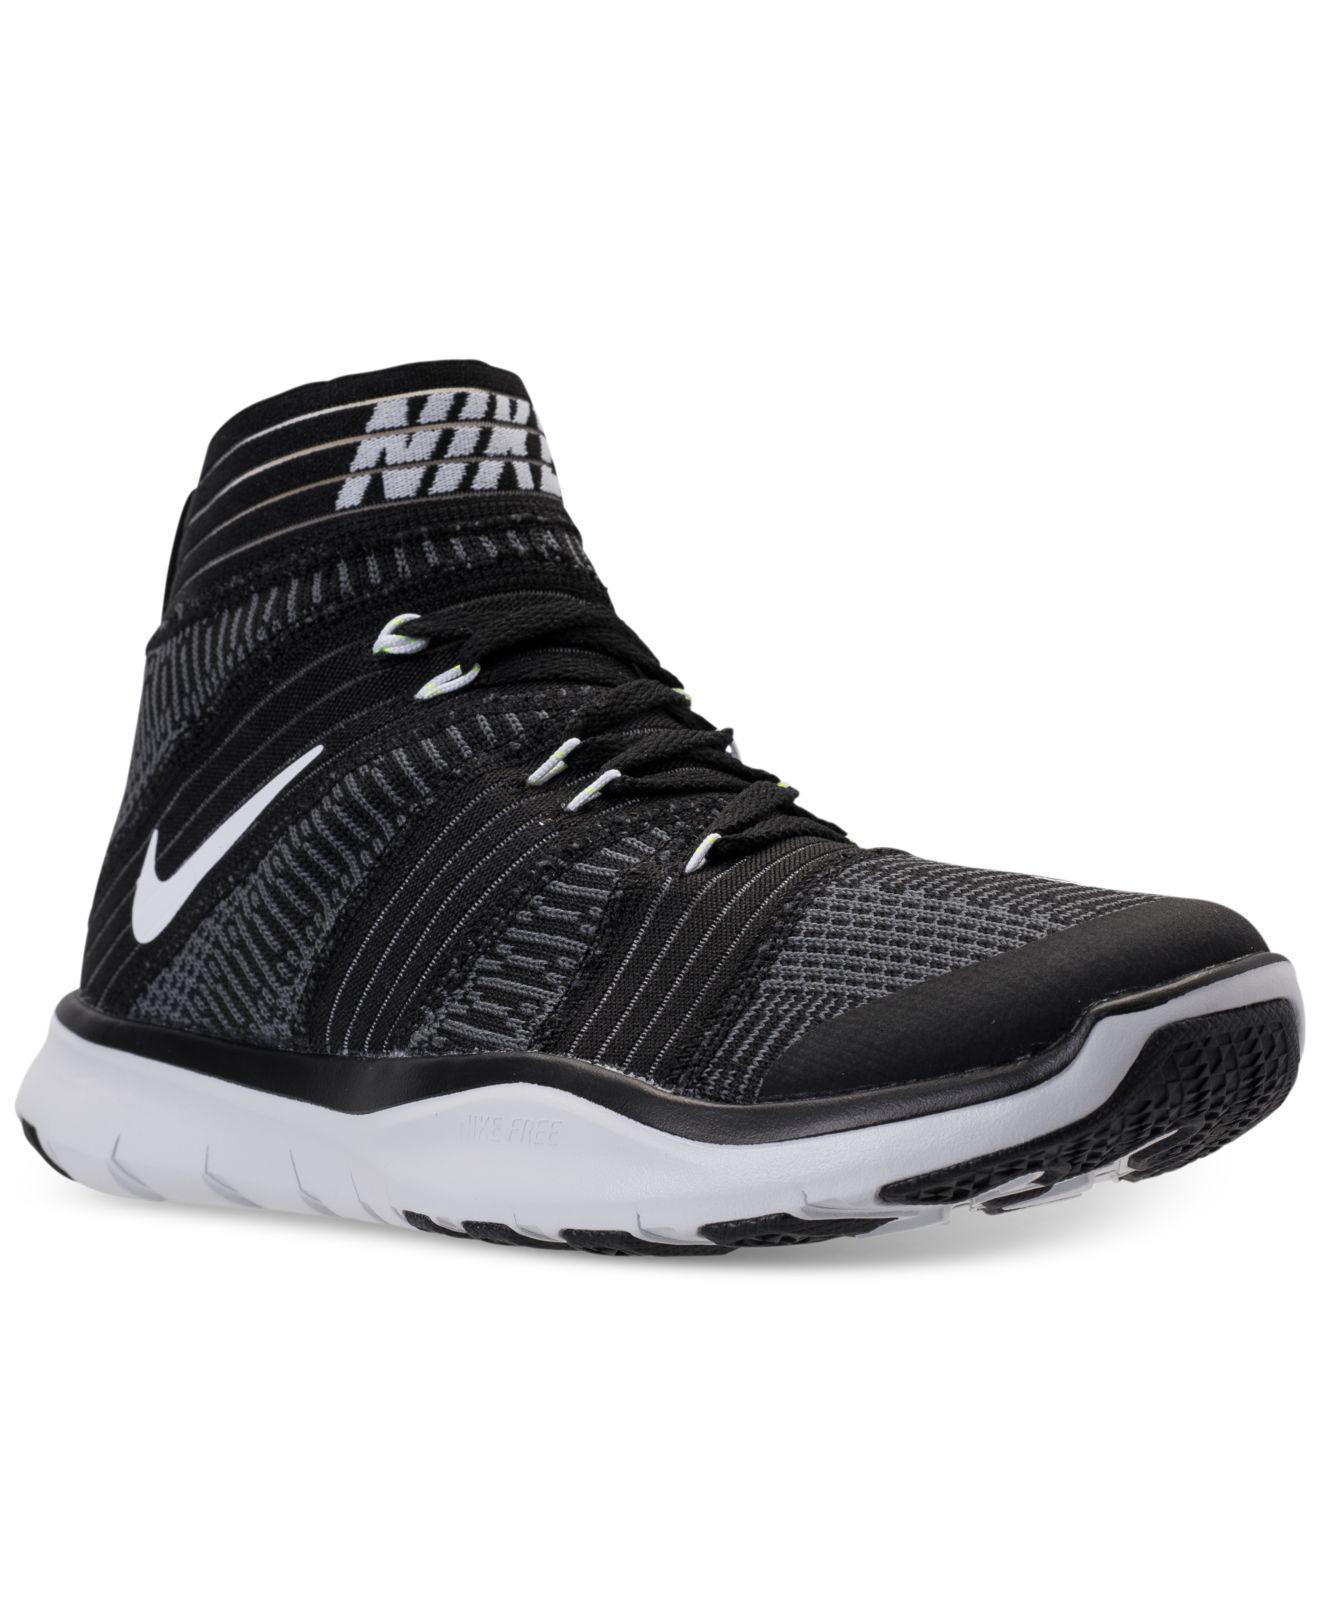 03a07ffea0 nike-BLACKWHITEDARKGREYPURE-Mens-Free-Train-Instinct-2-Training-Sneakers-From-Finish-Line.jpeg